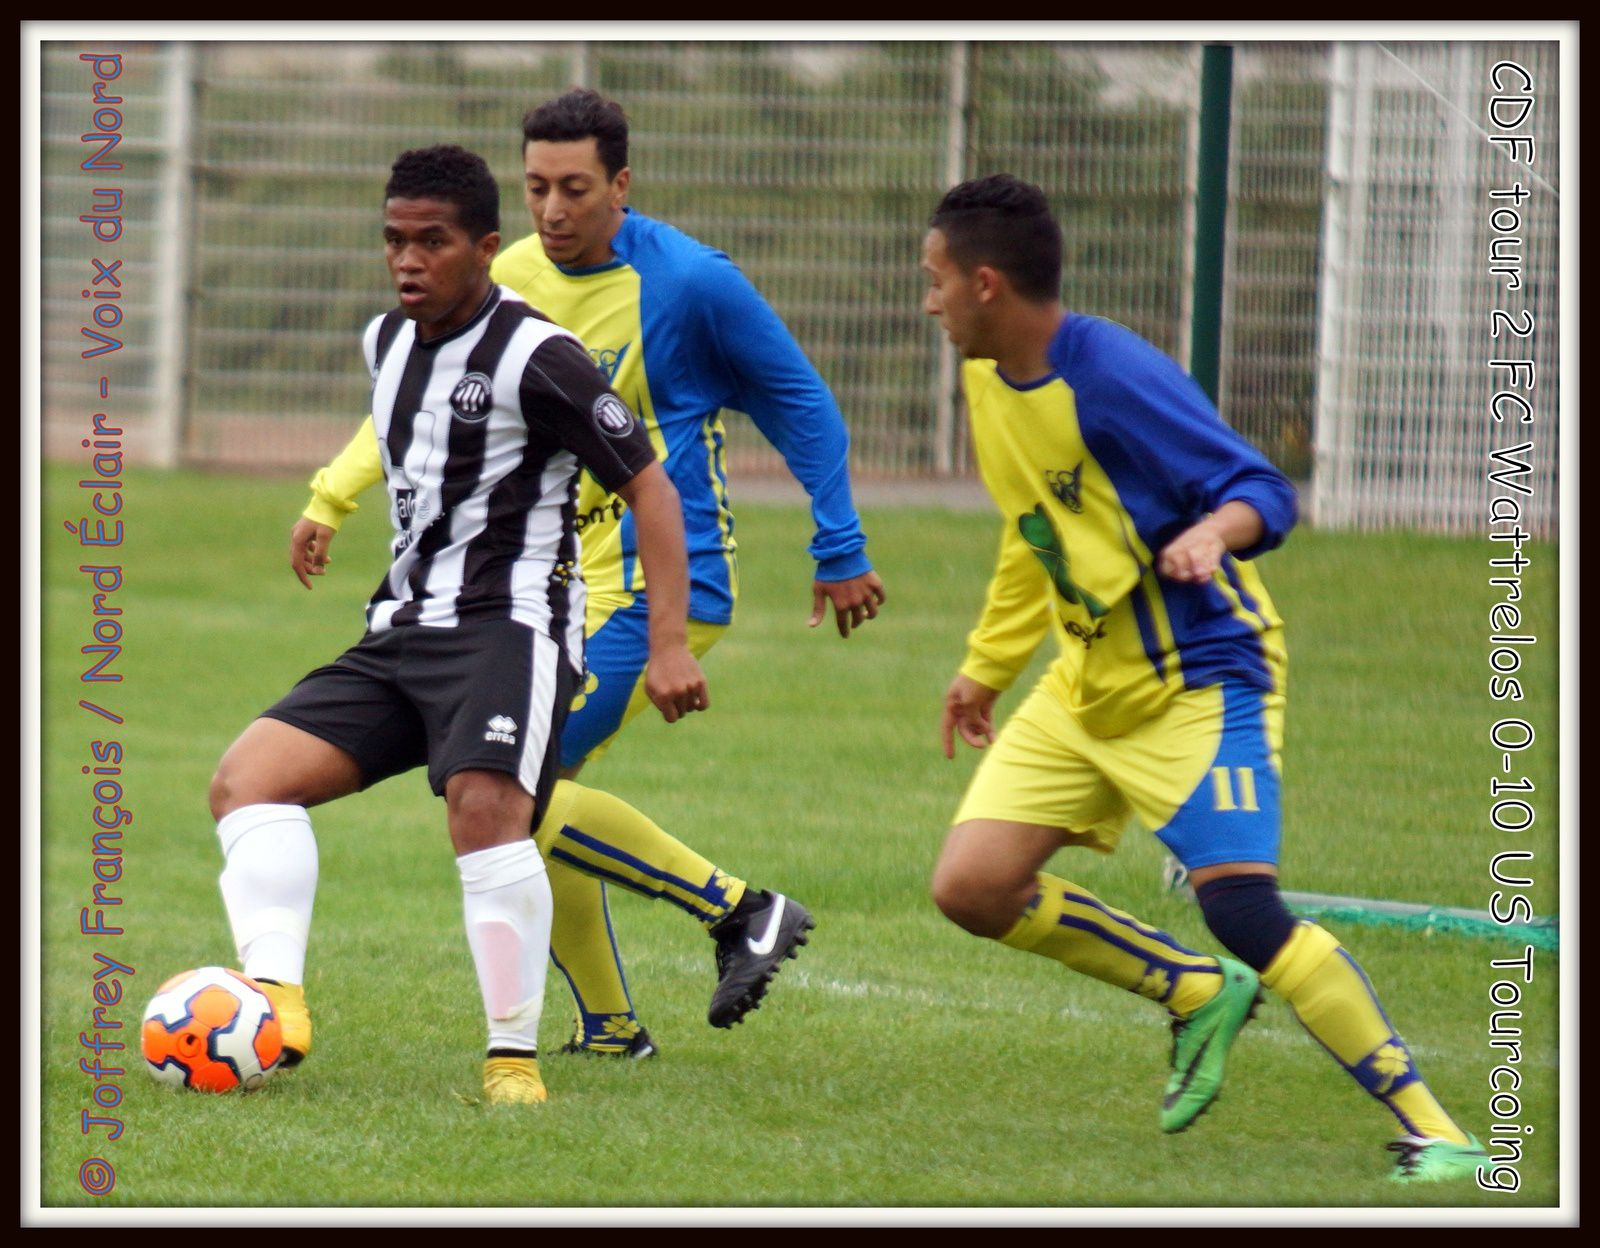 12.09.15 CDF tour 2 FC Wattrelos - US Tourcoing